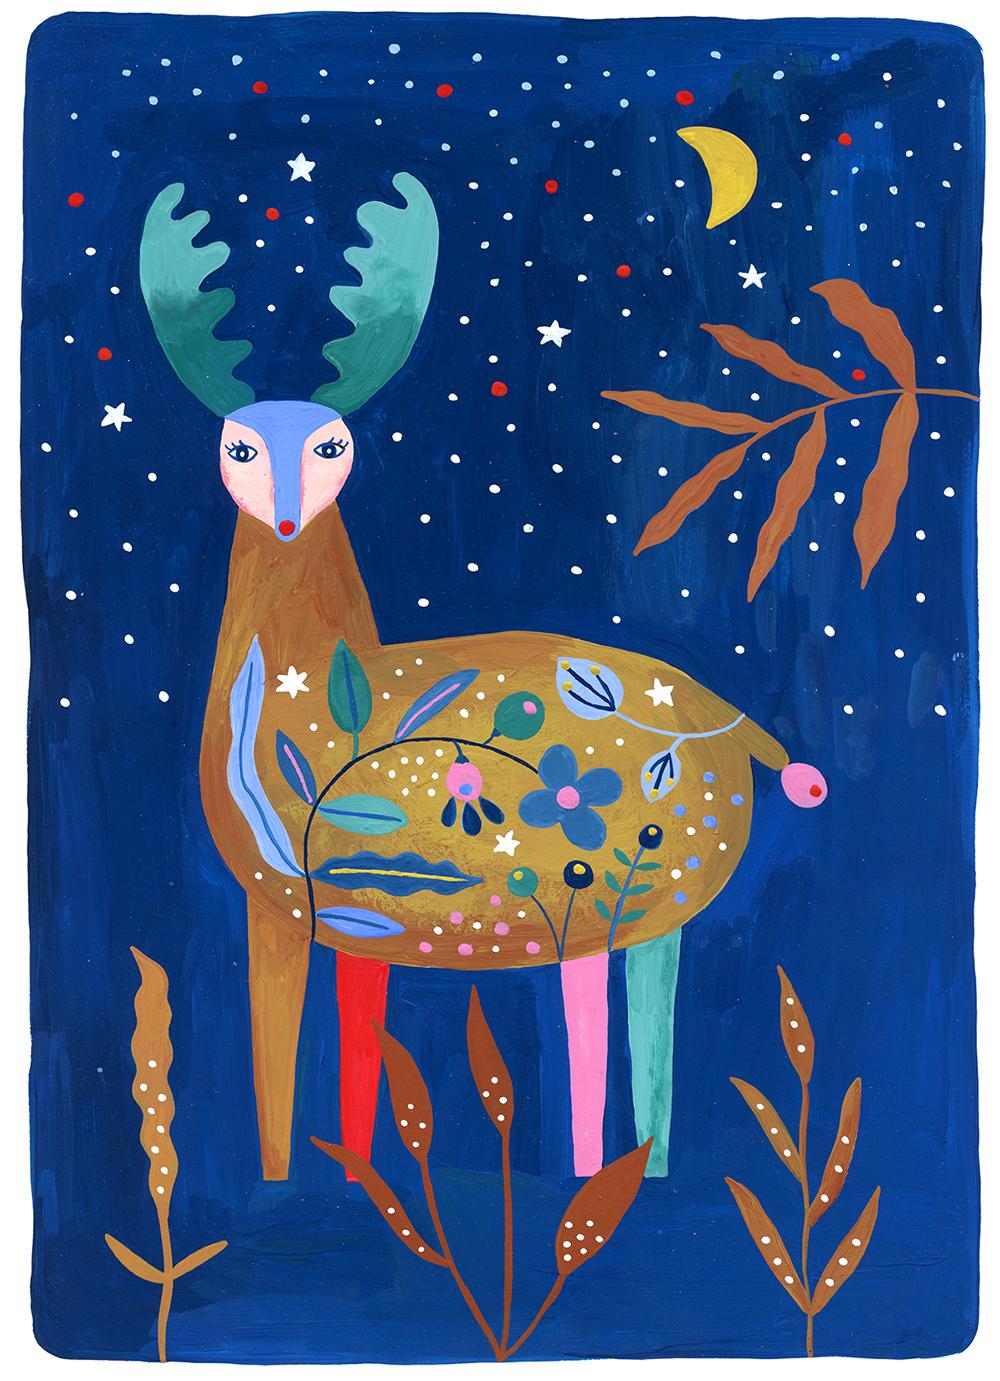 Marenthe illustration Menagerie2018 Reindeer.jpg